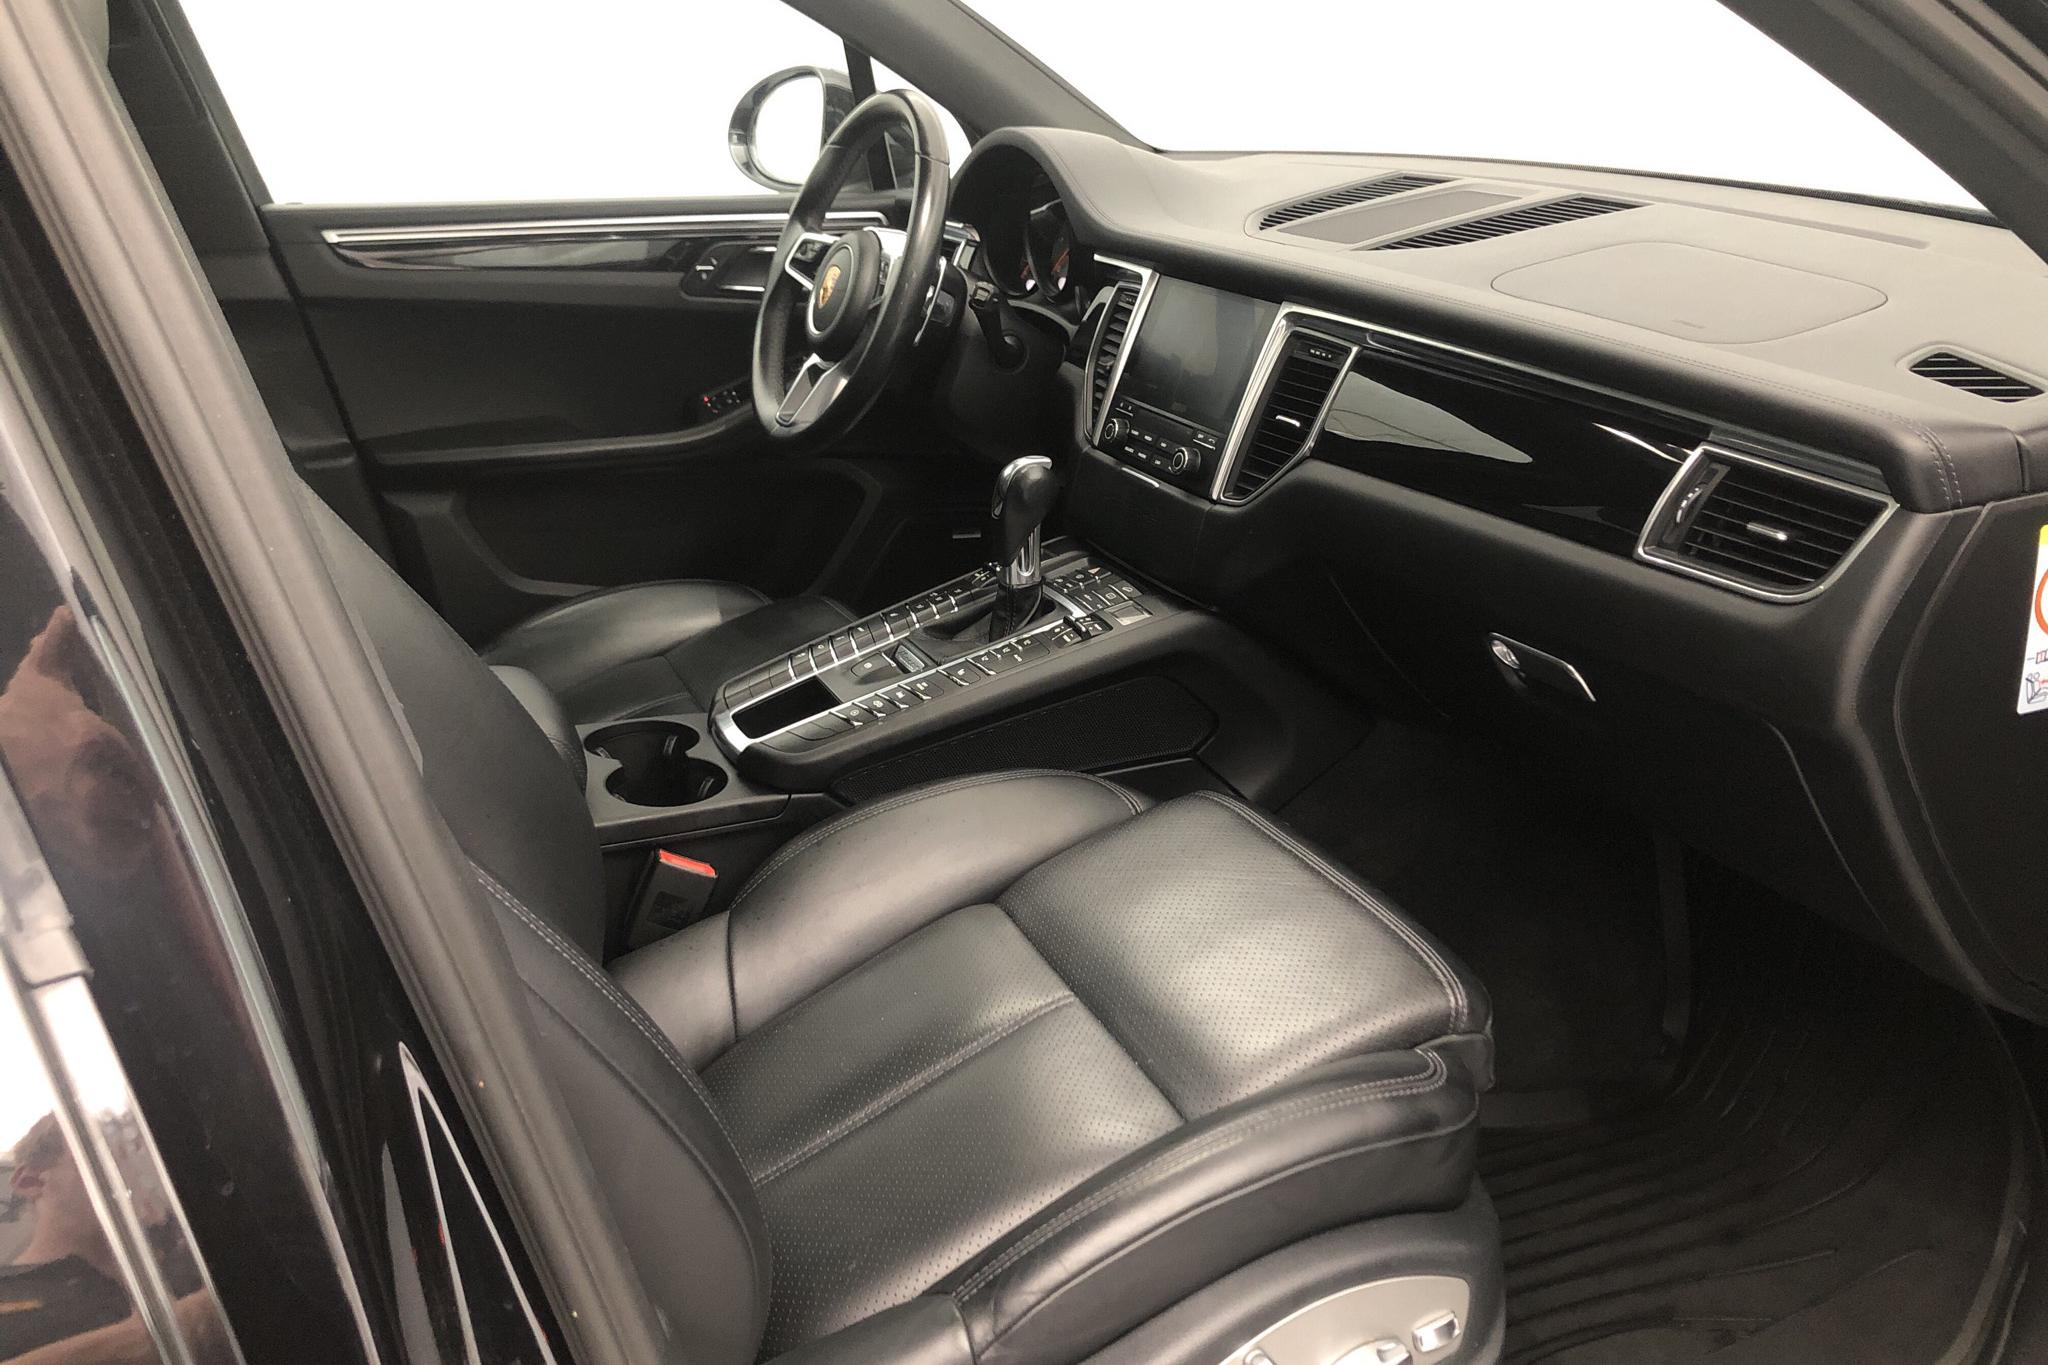 Porsche Macan 3.0 S Diesel (258hk) - 74 400 km - Automatic - black - 2017